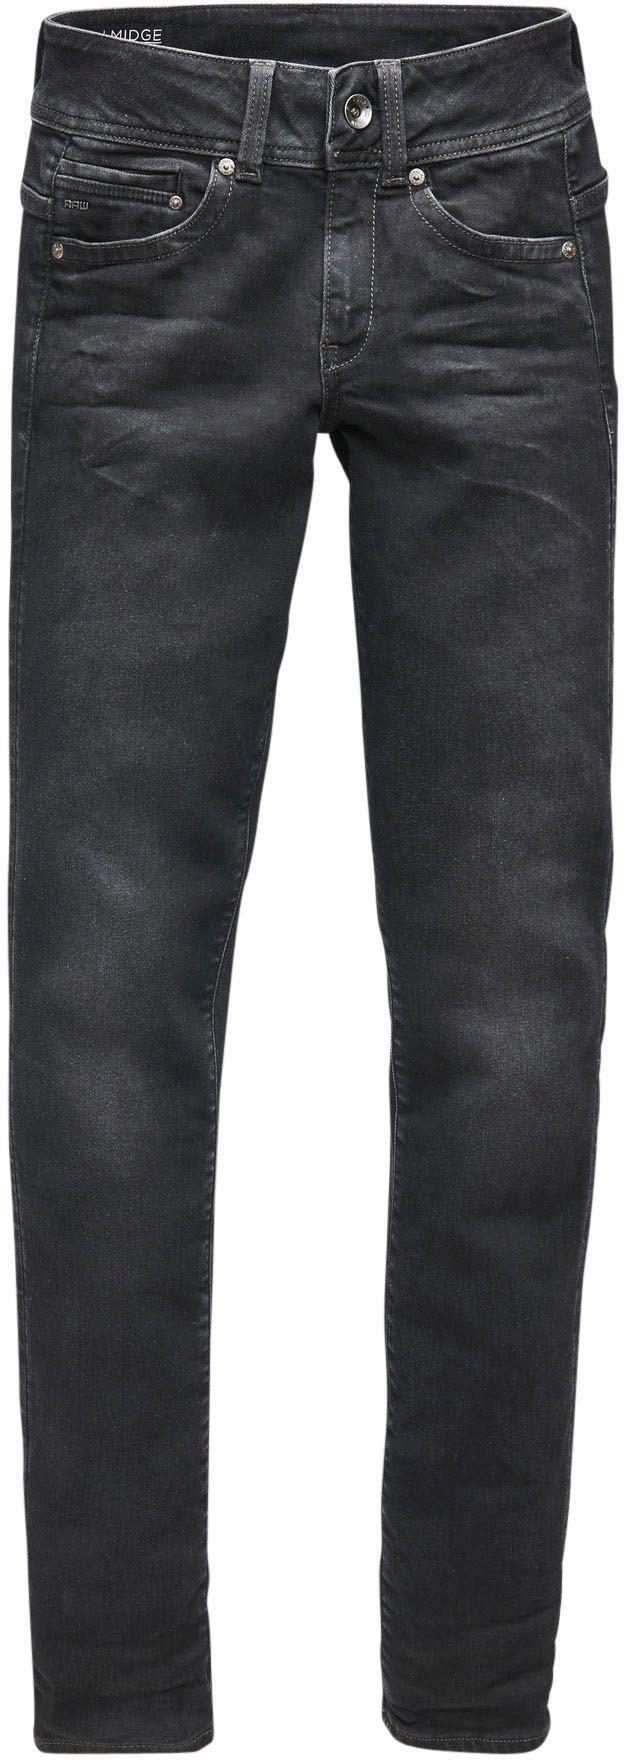 G-Star Raw straight jeans »Midge Saddle Mid Straight« voordelig en veilig online kopen